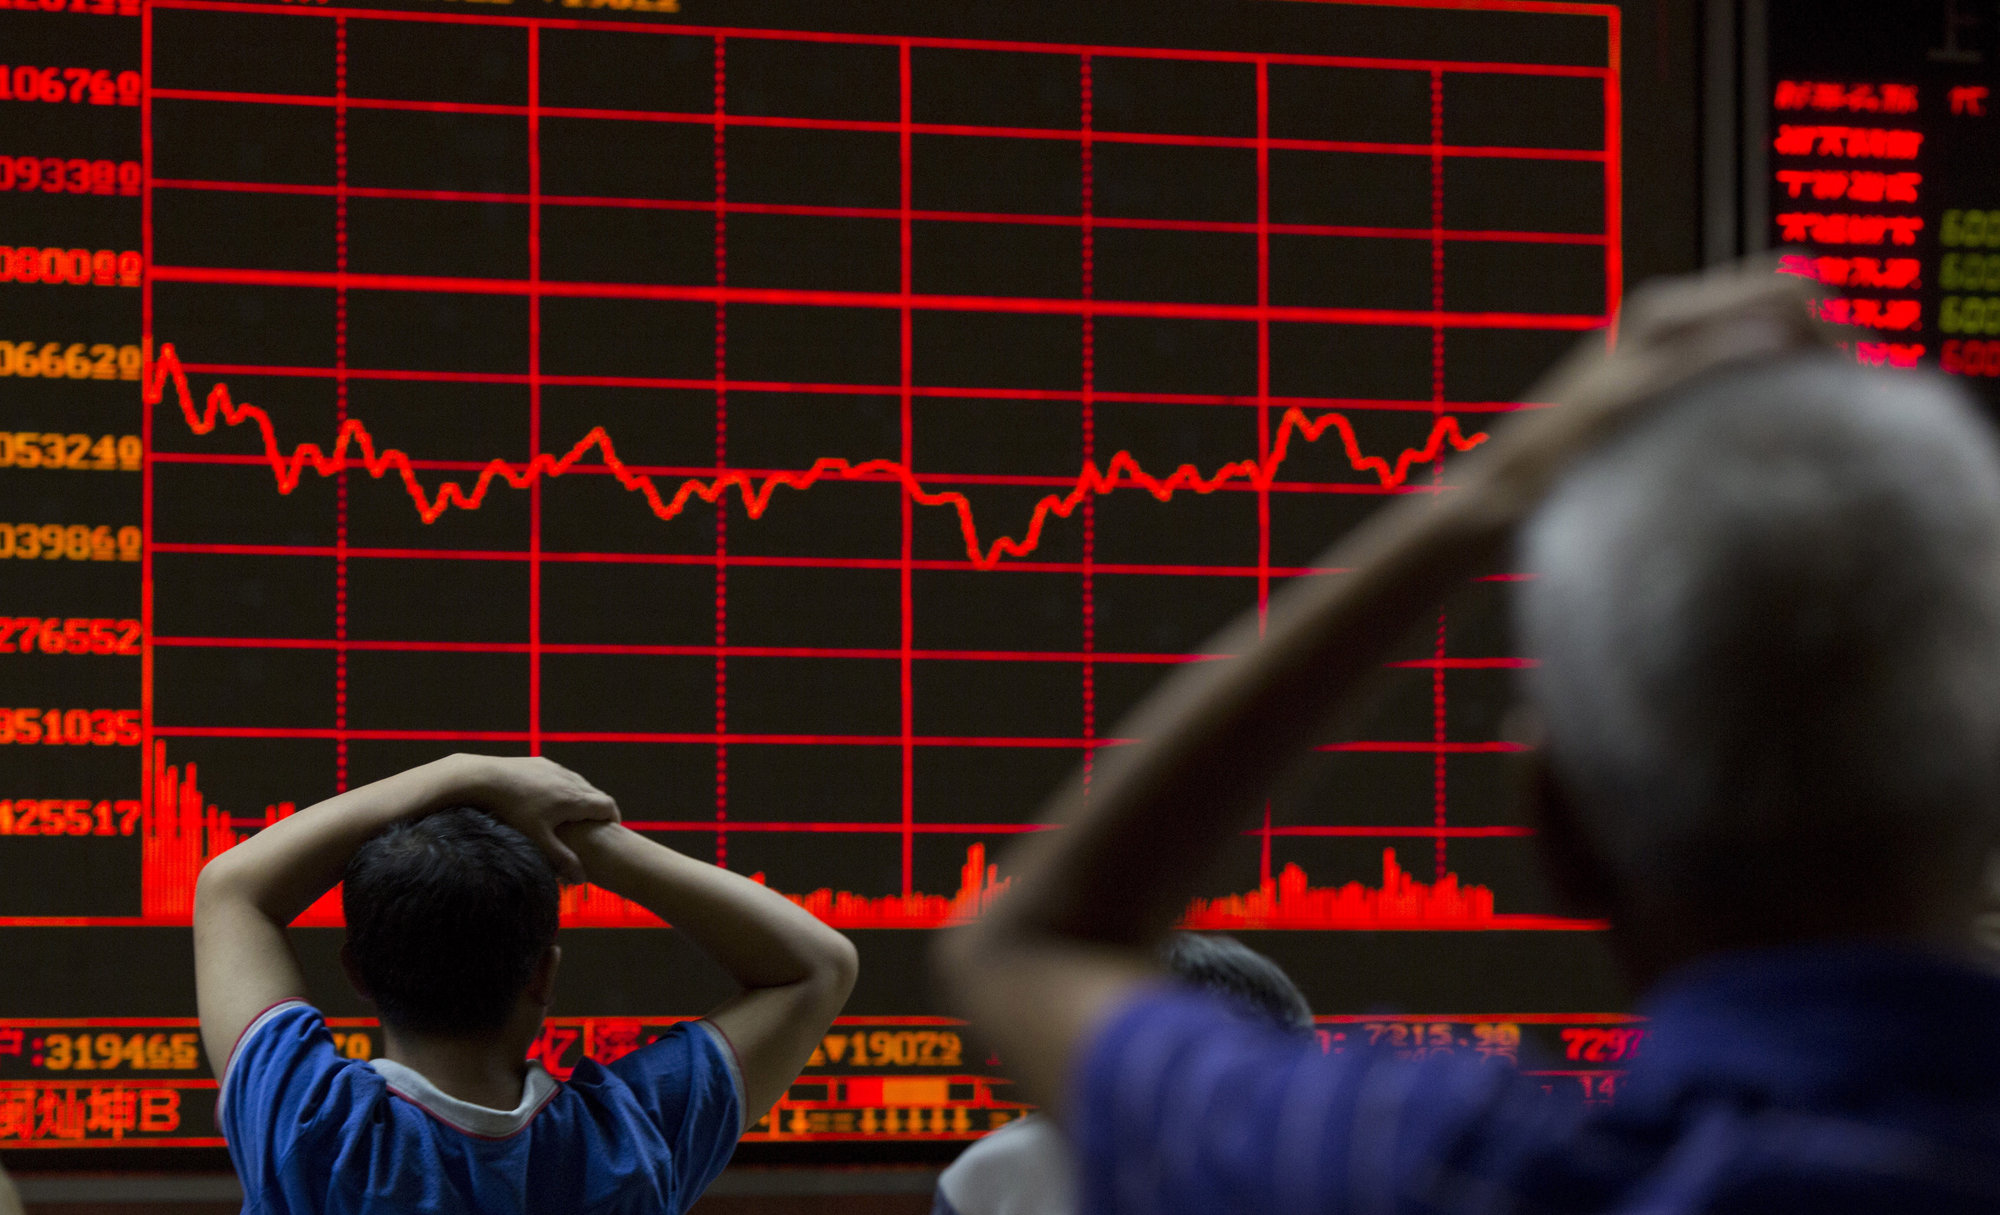 Китайский шанс на $5 триллионов